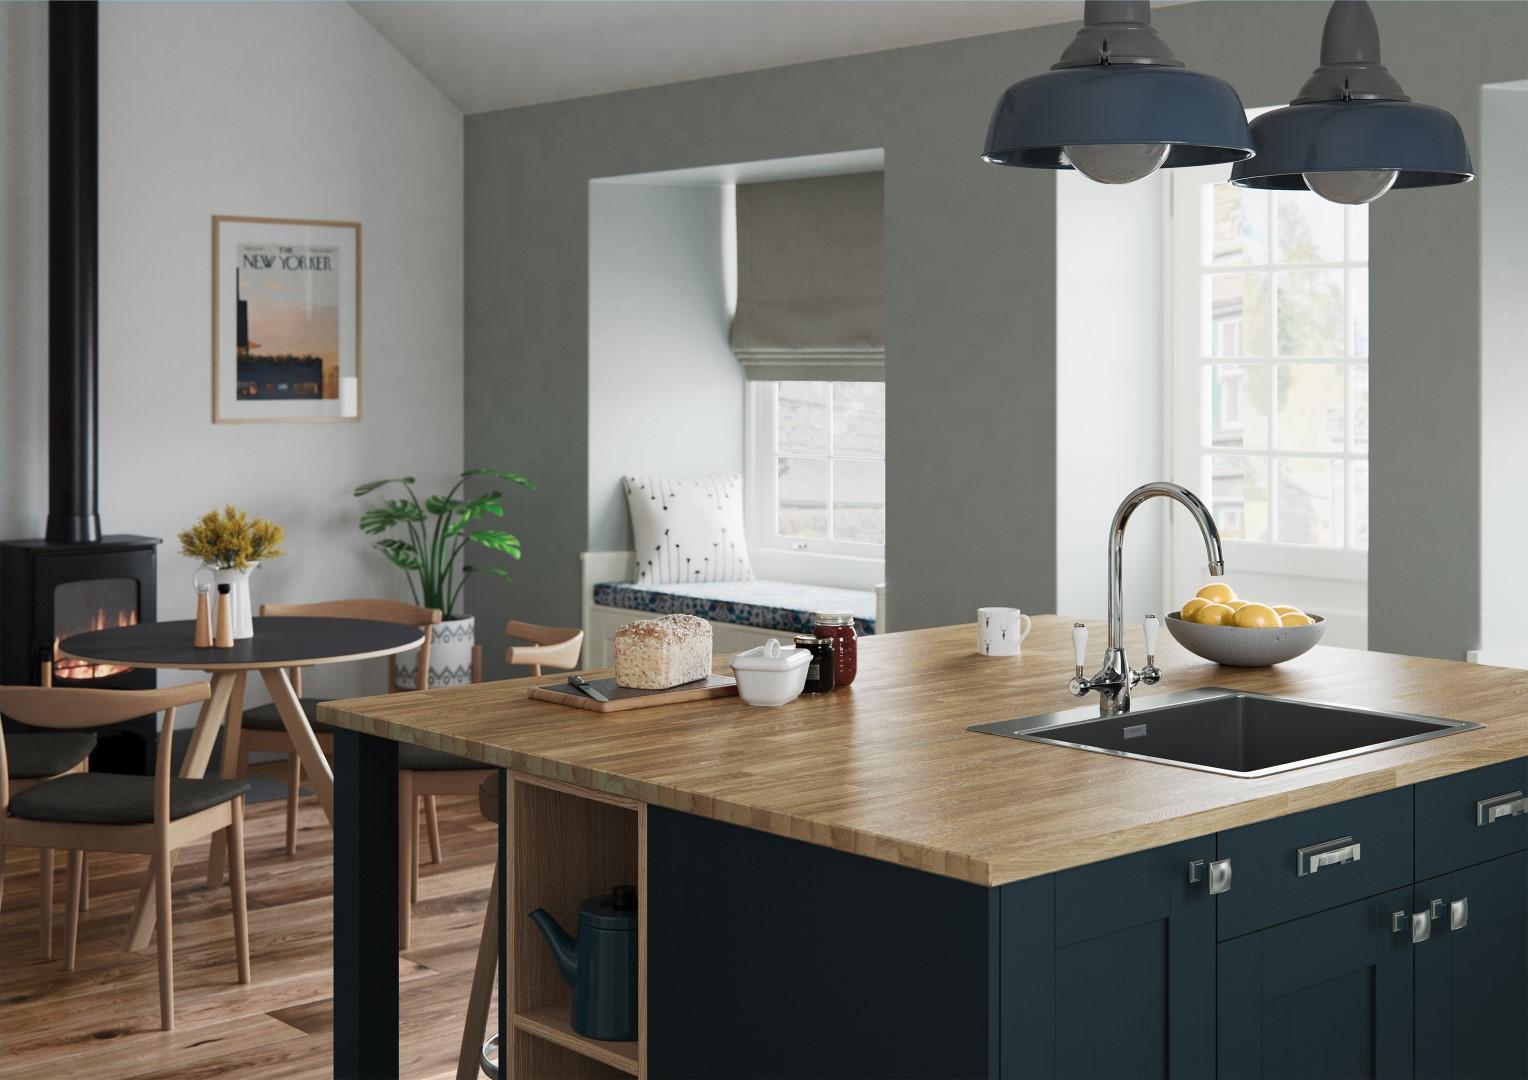 Madison Porcelain and Marine - Kitchen Design - Alan Kelly Kitchens - Waterford - 1